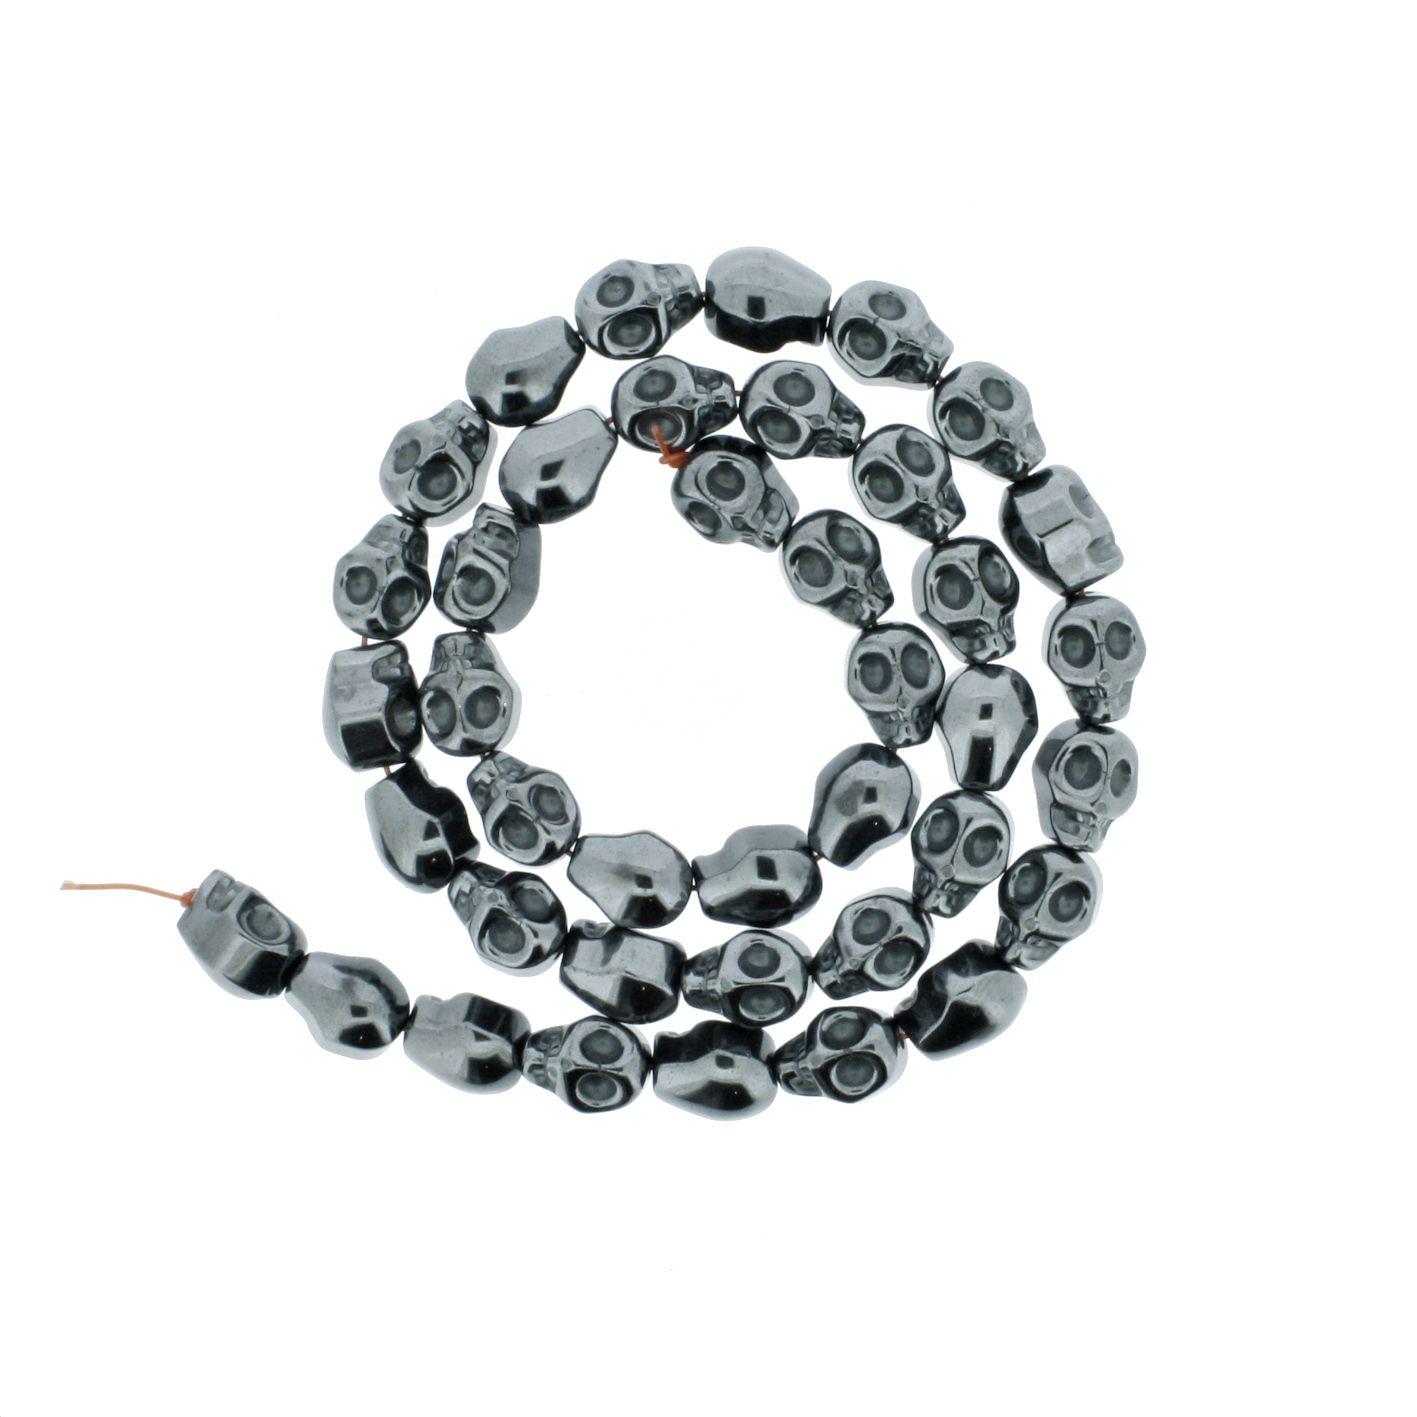 Fio de Pedra - Hematita Caveira - 10mm  - Stéphanie Bijoux® - Peças para Bijuterias e Artesanato